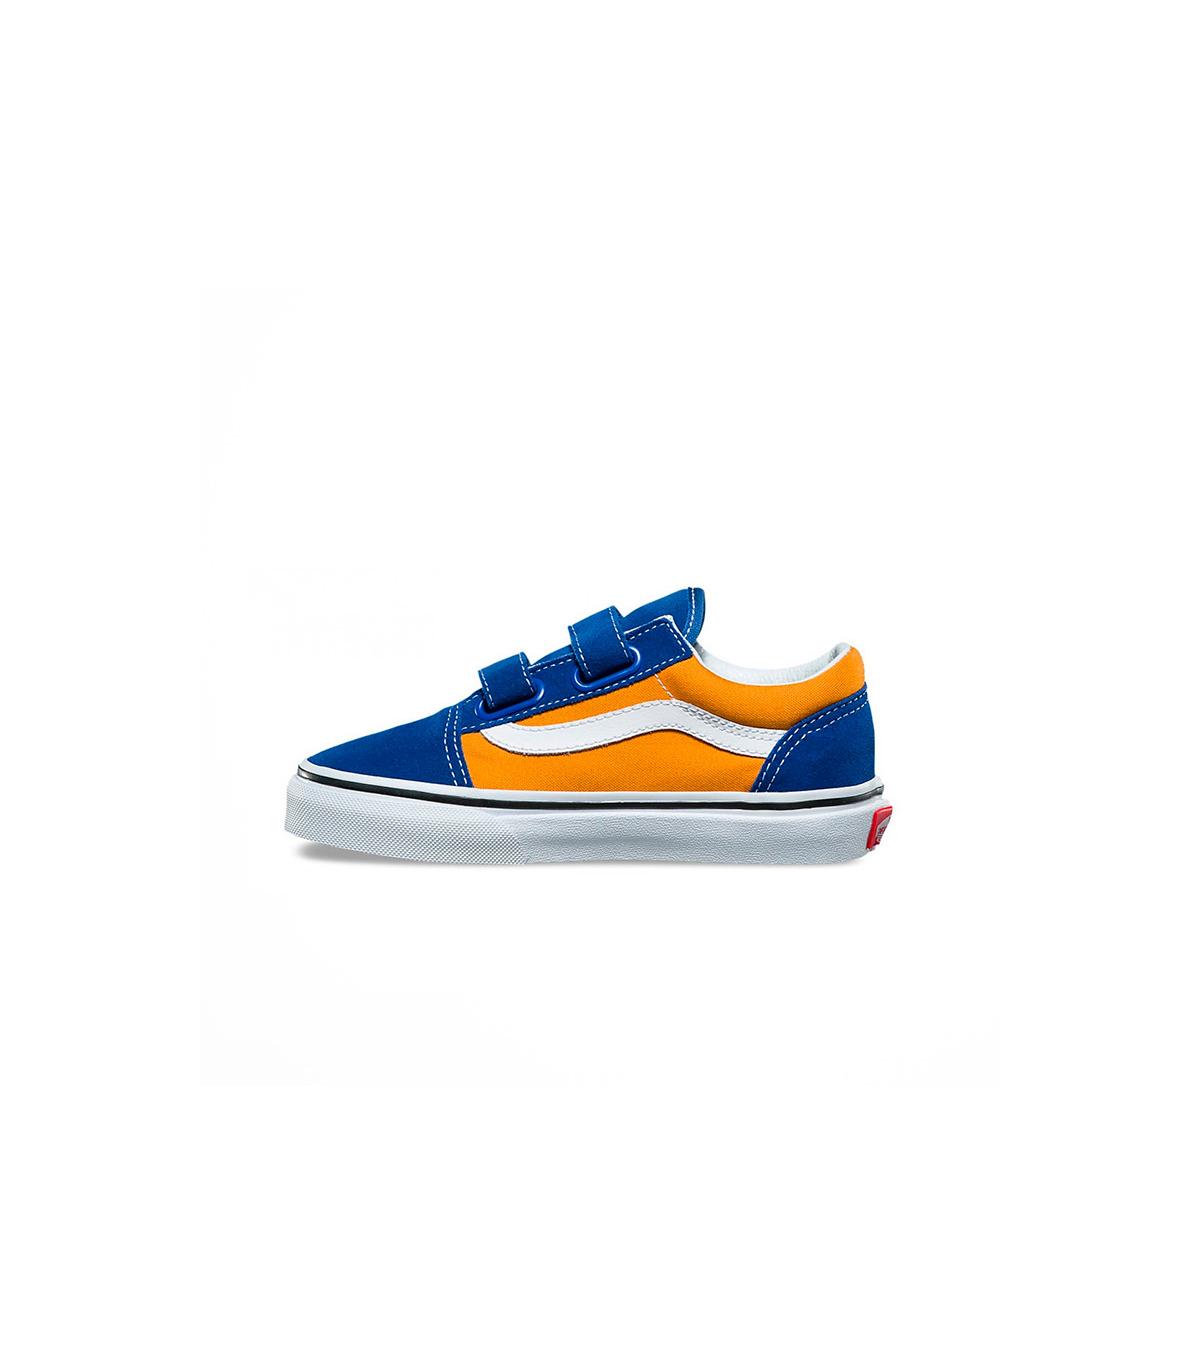 2087cf4e4 Buy Vans Old Skool V Pop Amarillo